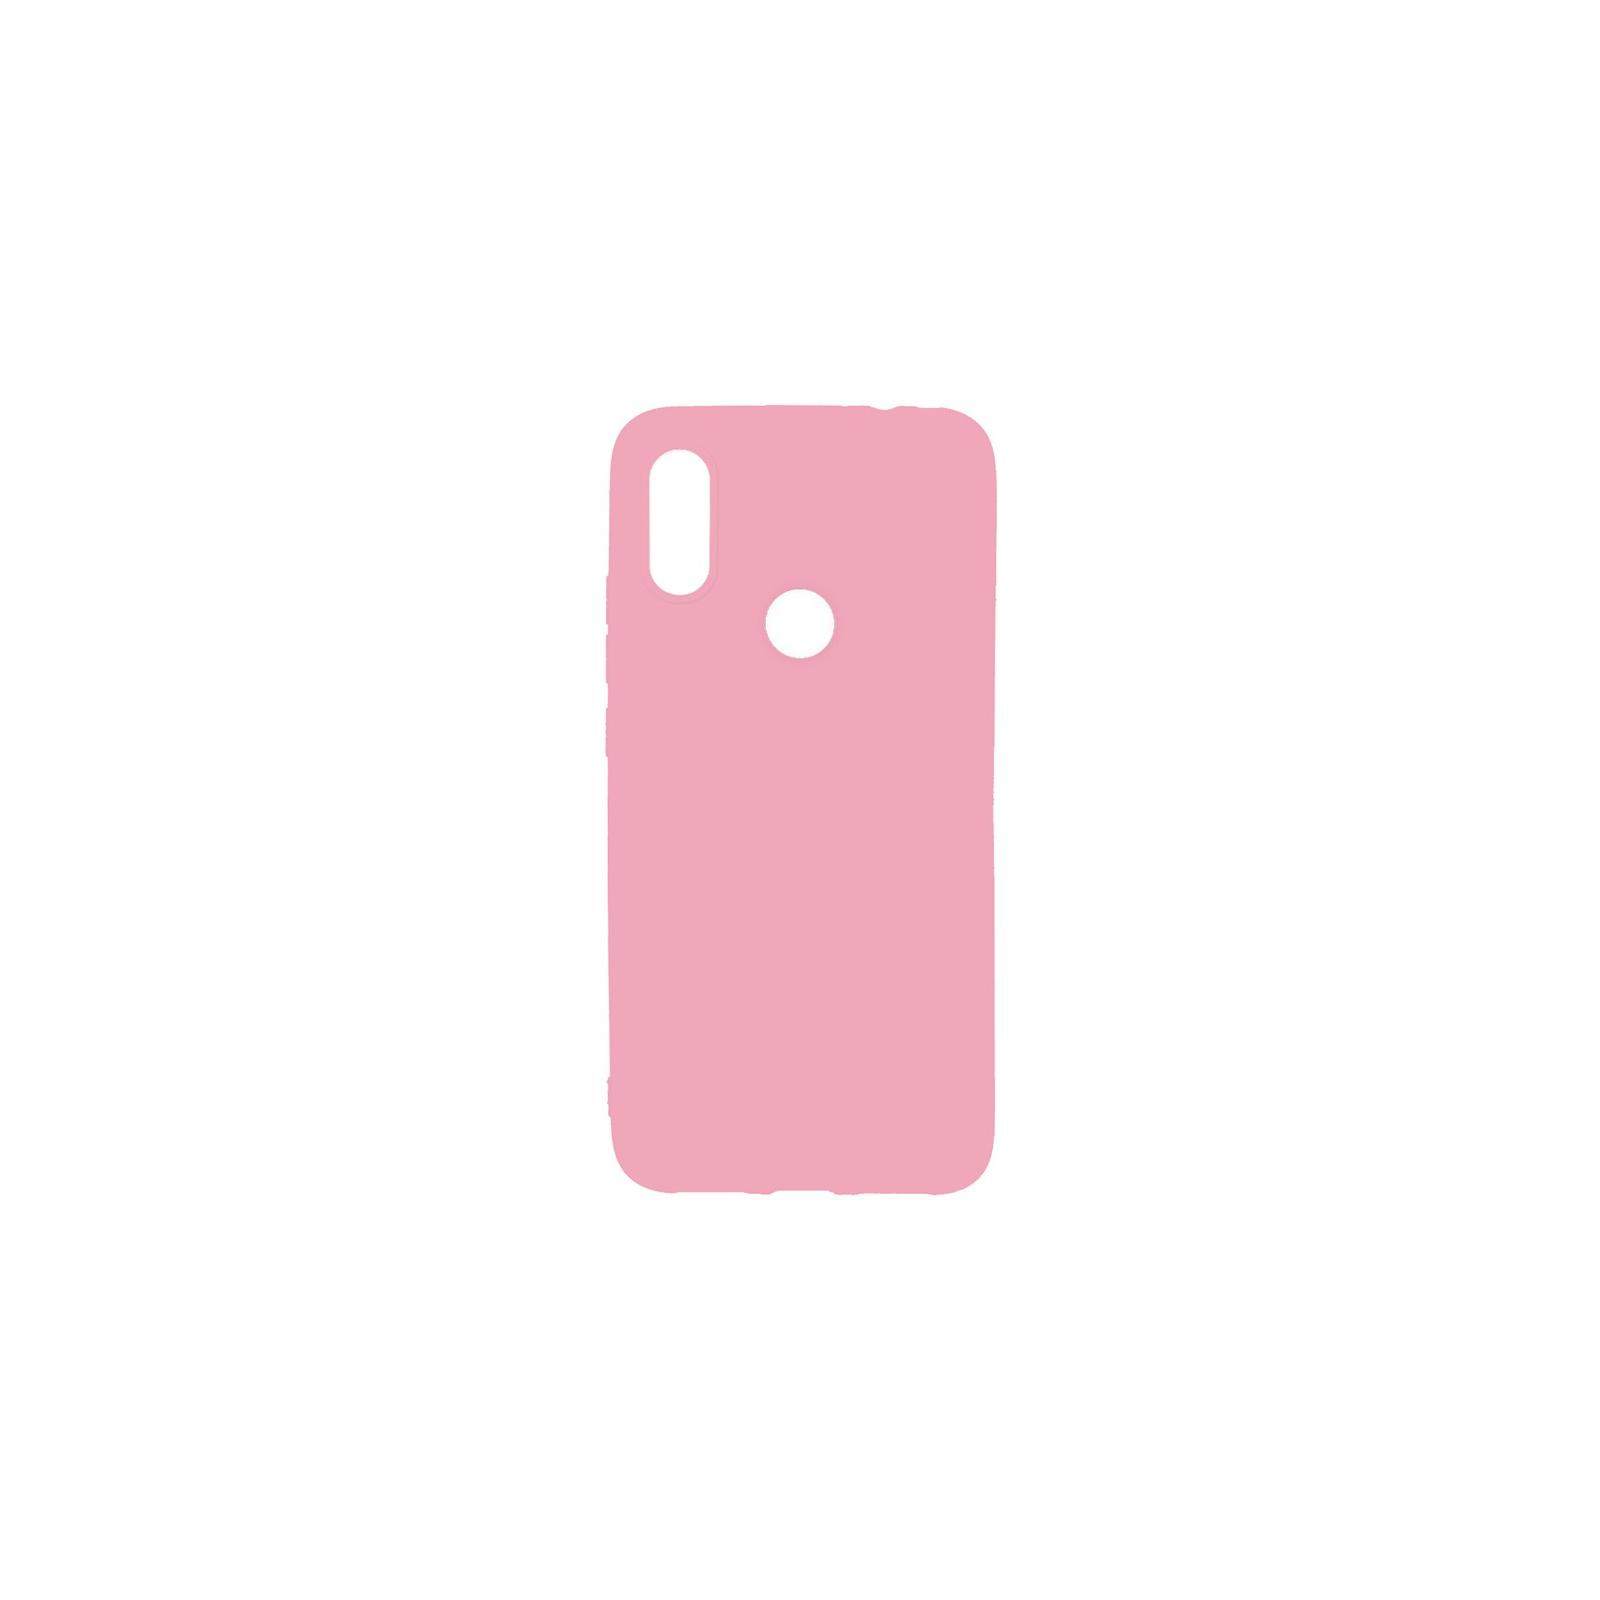 Чехол для моб. телефона Toto 1mm Matt TPU Case Xiaomi Redmi 7 Pink (F_94089)